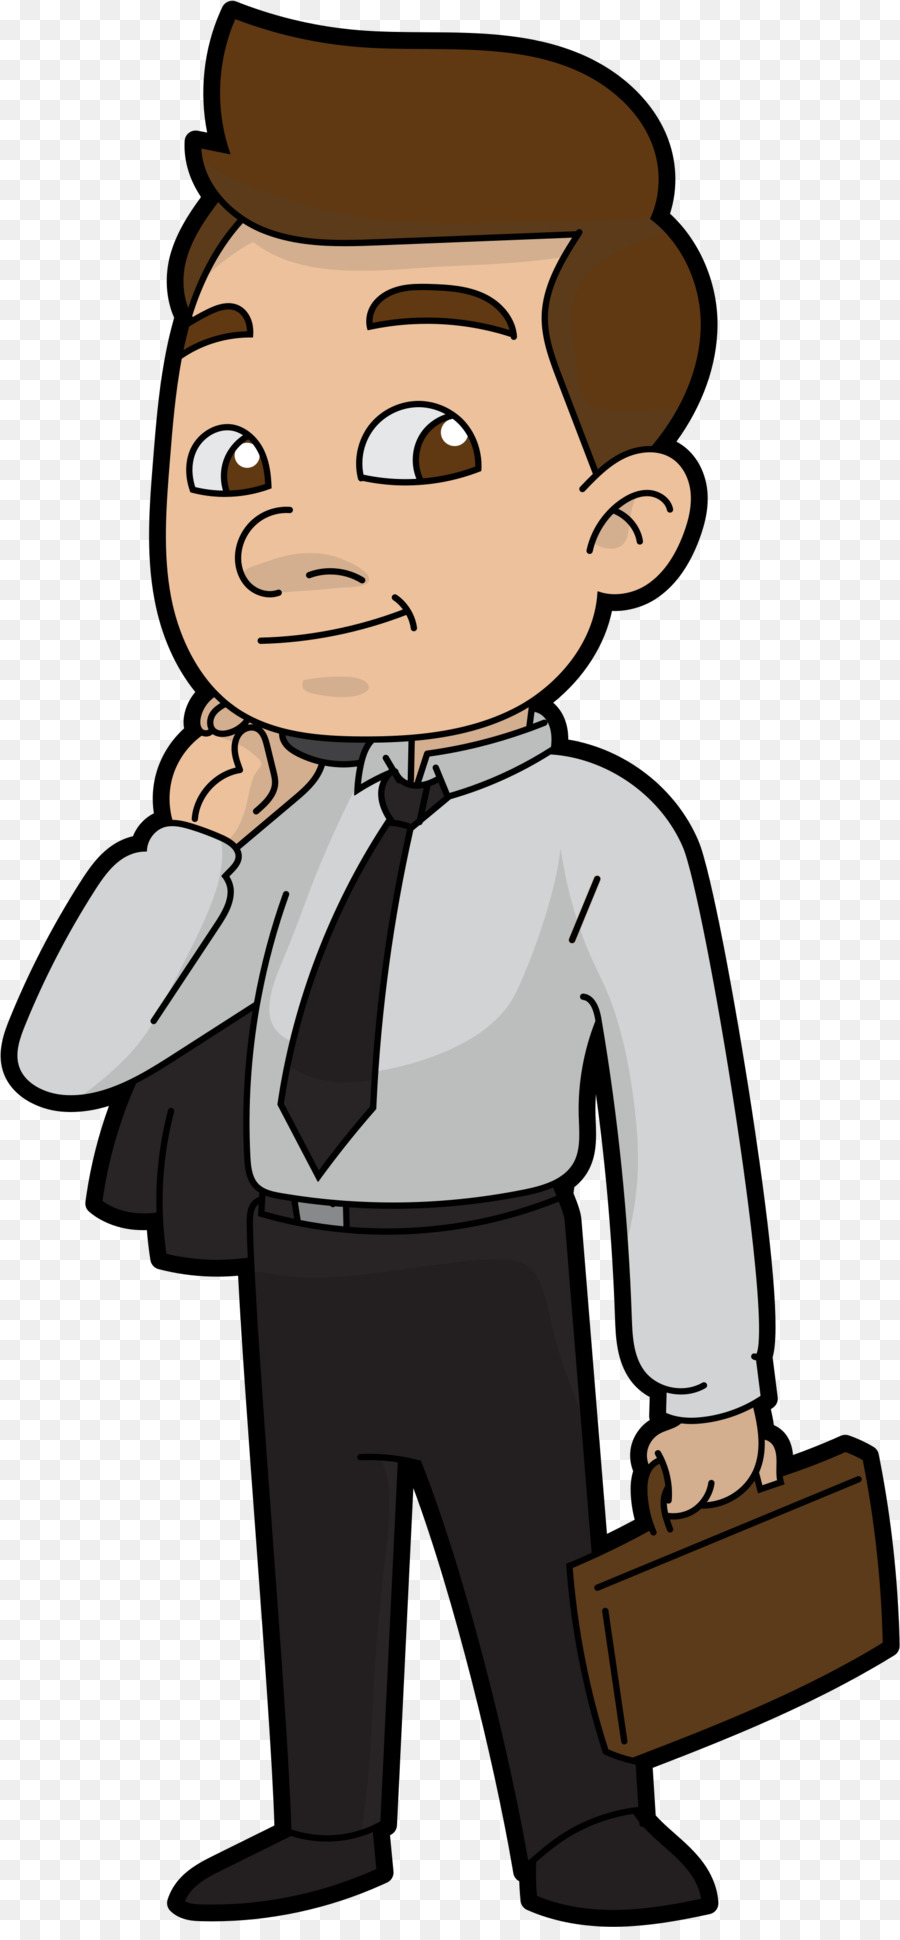 Businessperson Clip art Portable Network Graphics Cartoon Image.